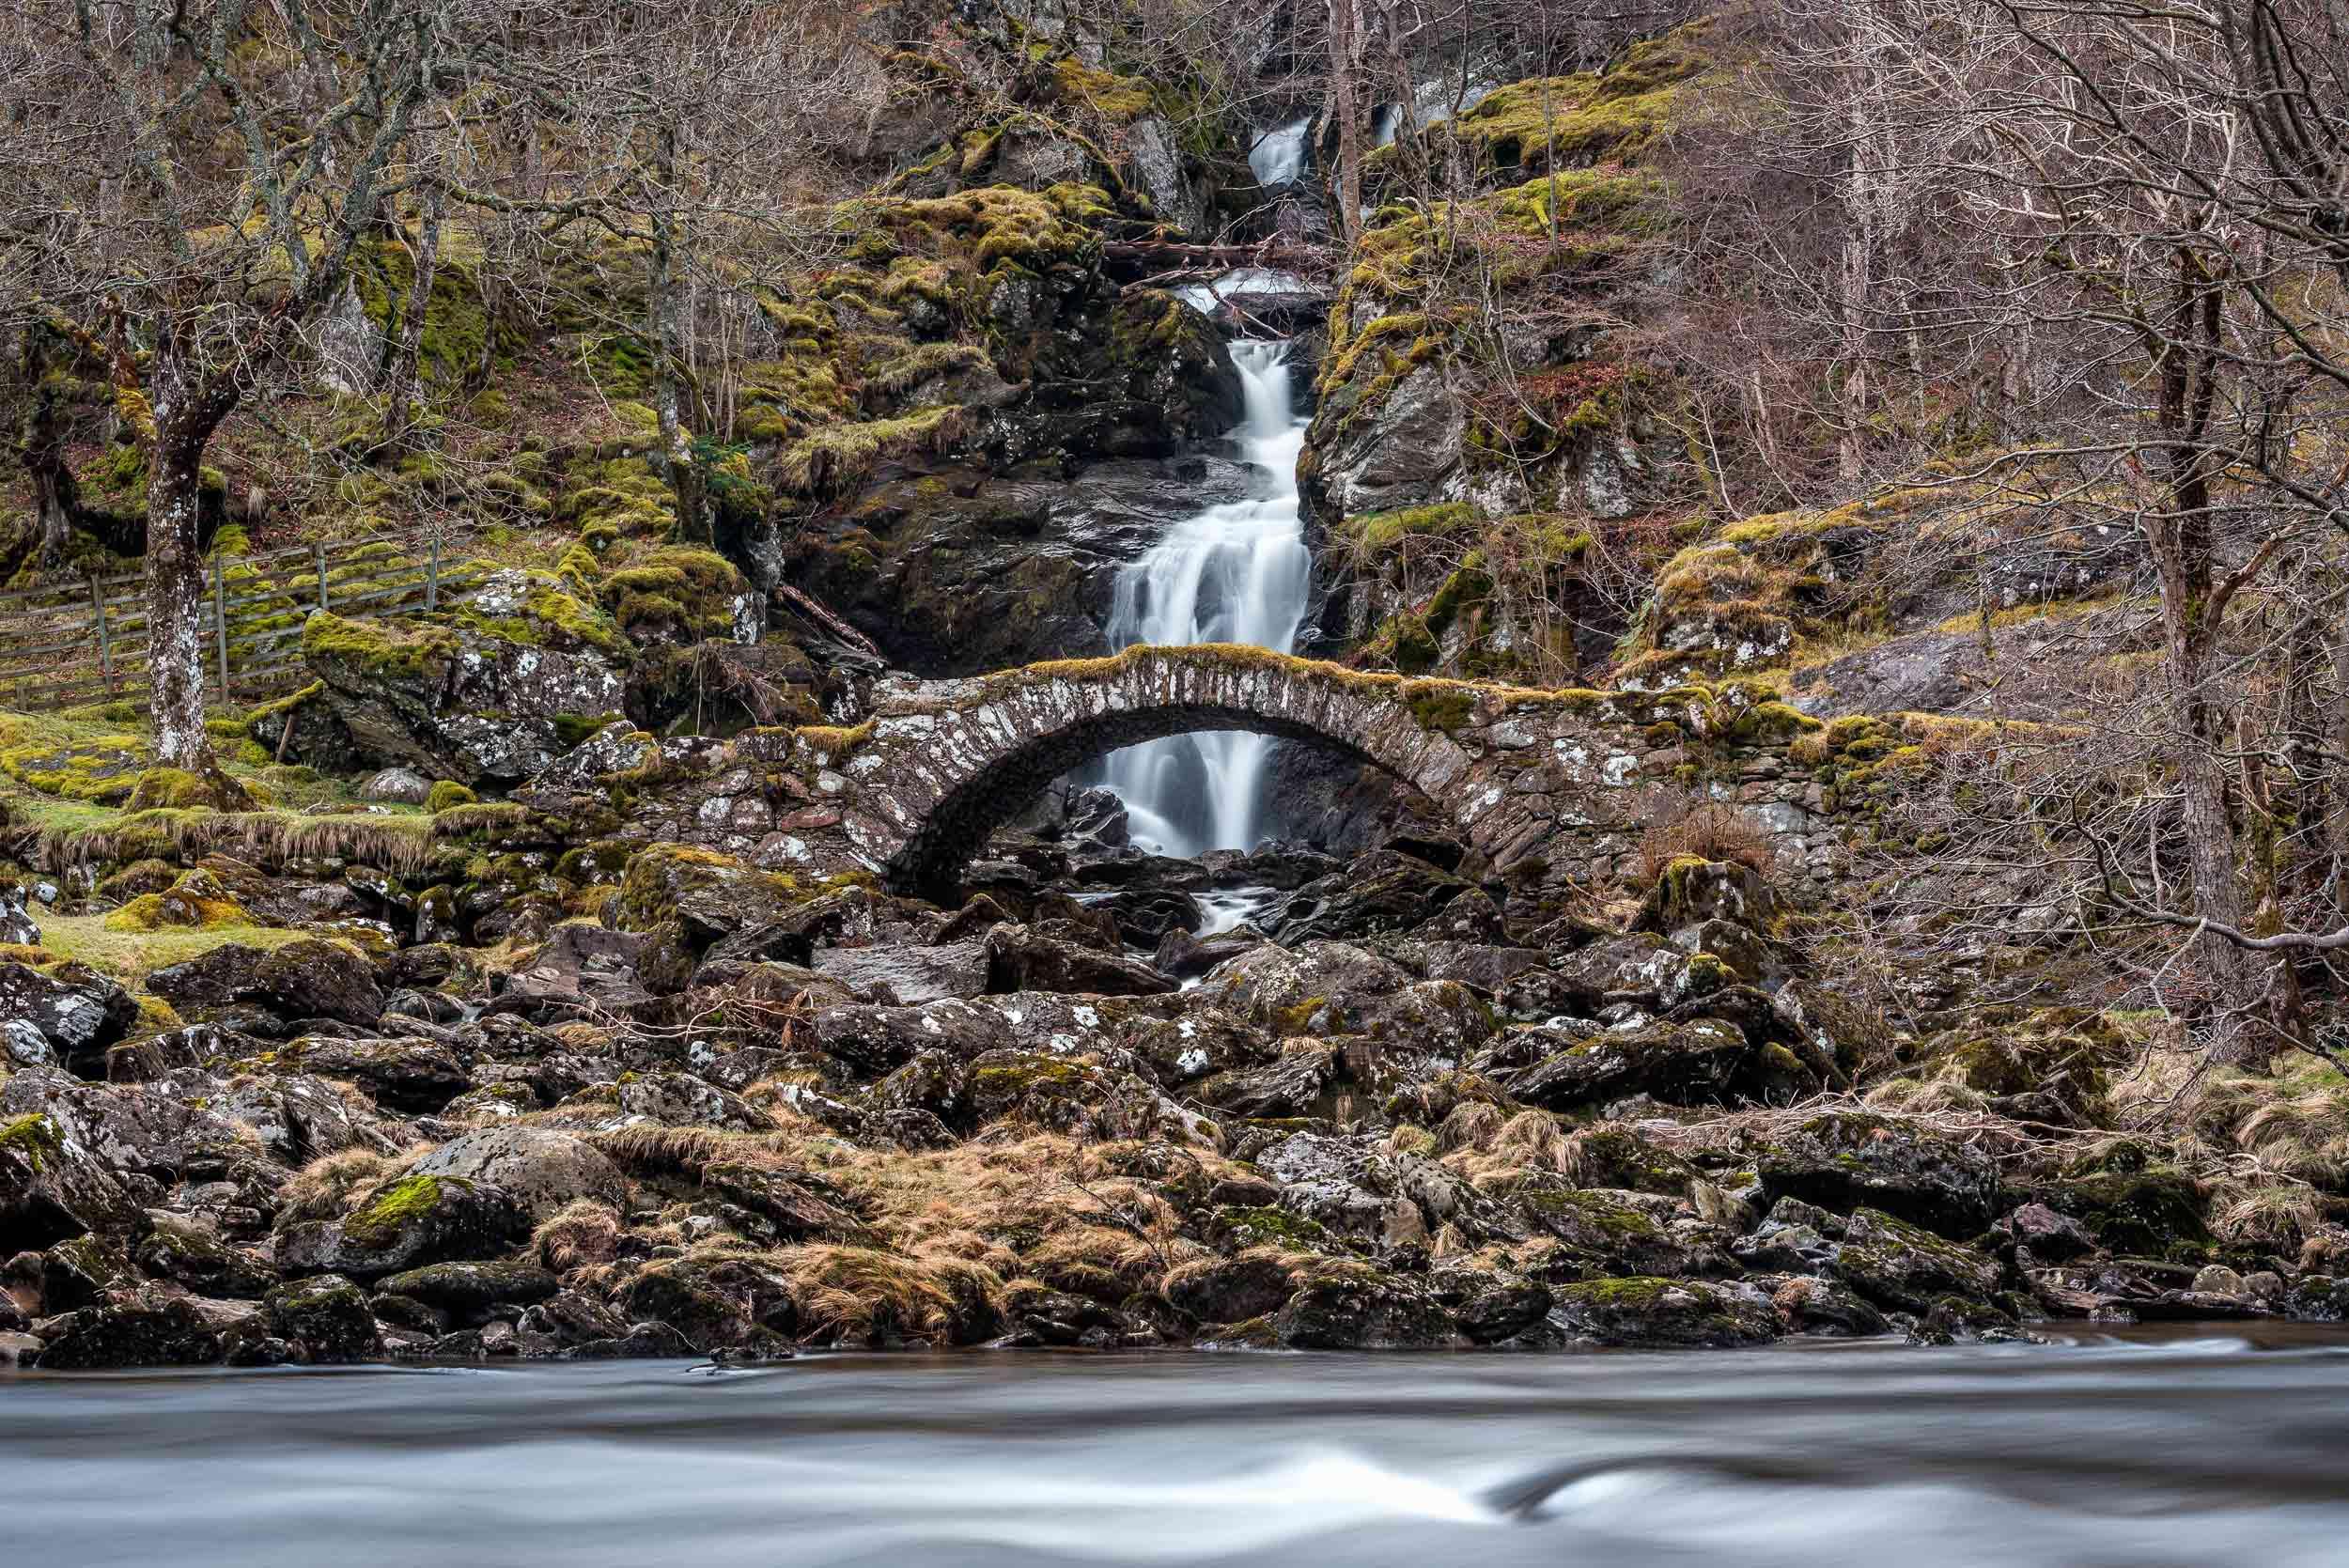 Roman Bridge,Glen Lyon, Scotland  (mountaintreks/Shutterstock)